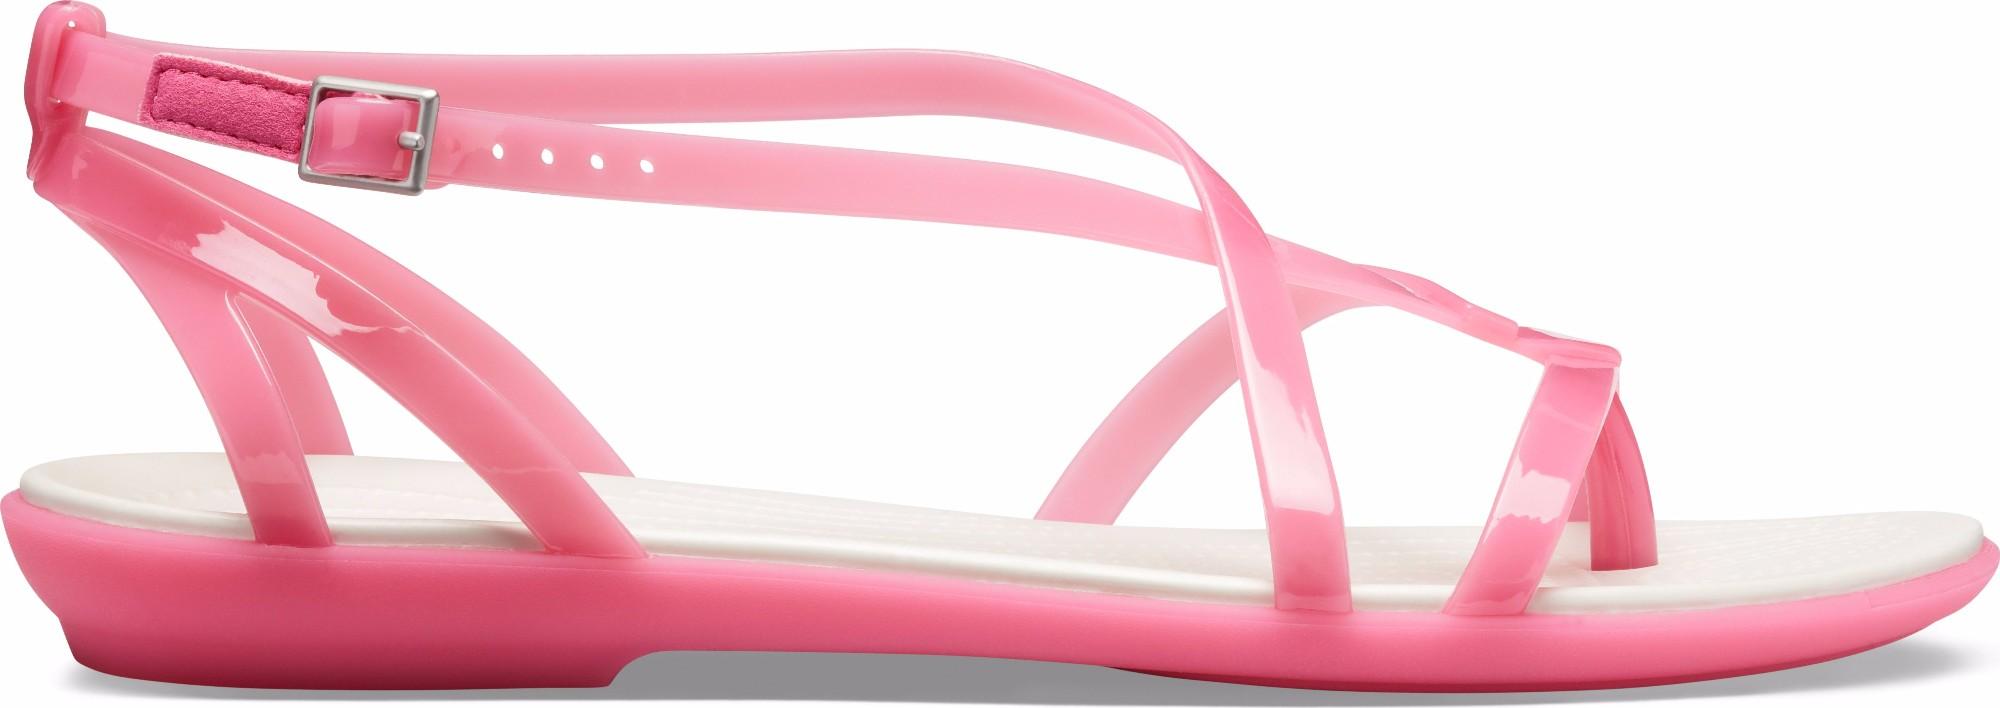 Crocs™ Isabella Gladiator Sandal Paradise Pink/Oyster 36,5